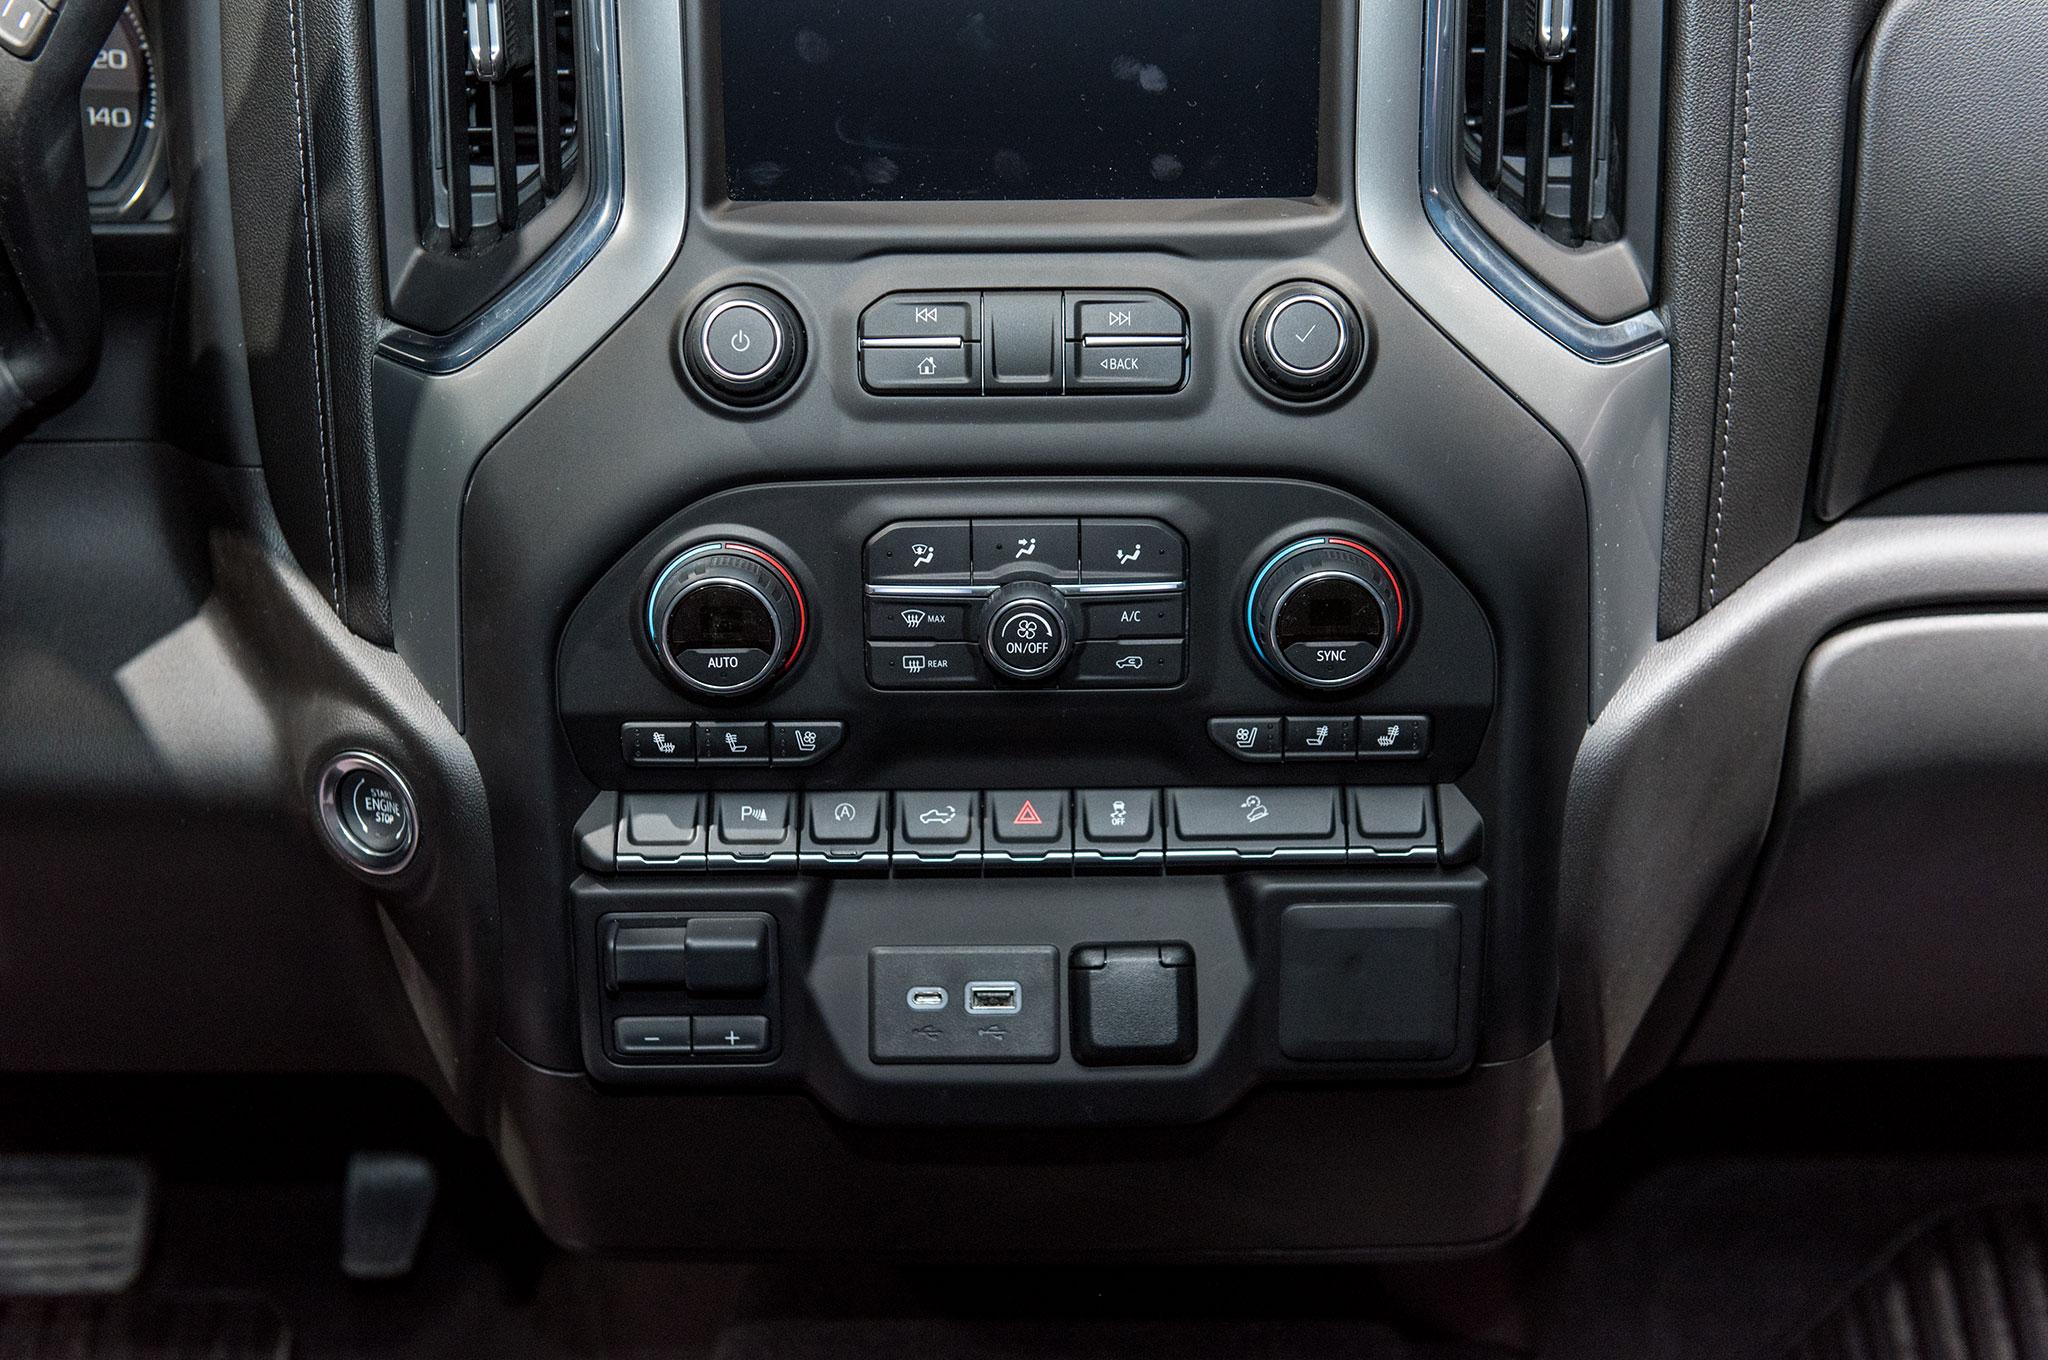 2019 Chevrolet Silverado 1500 Revealed in Detroit | Automobile Magazine